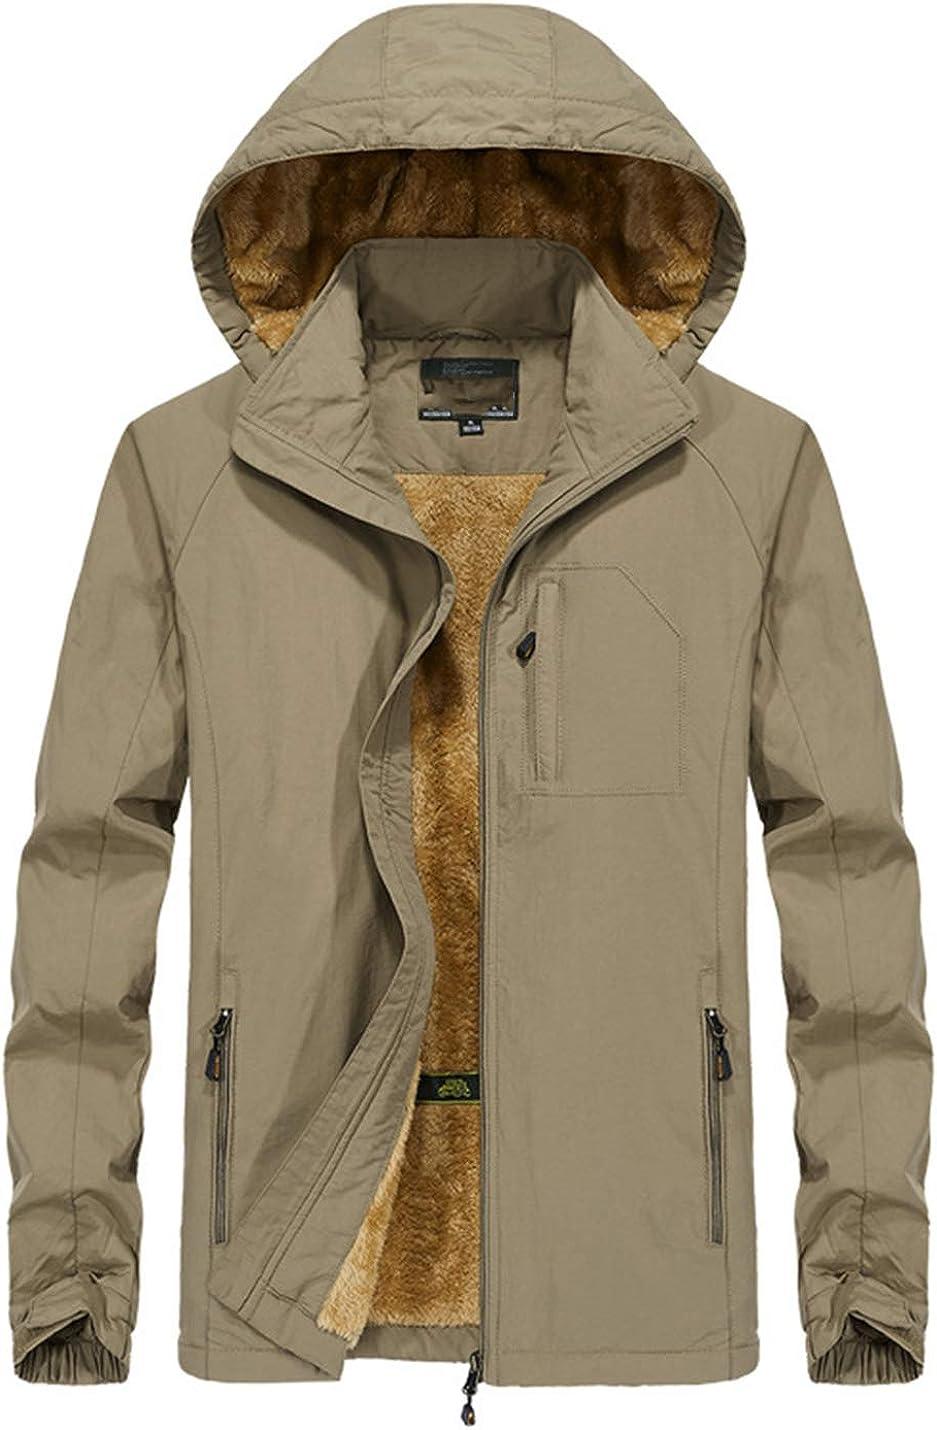 PAODIKUAI Men Mountain Waterproof Ski Jacket Coat Warm Fleece Hood Thicken Jacket Coat